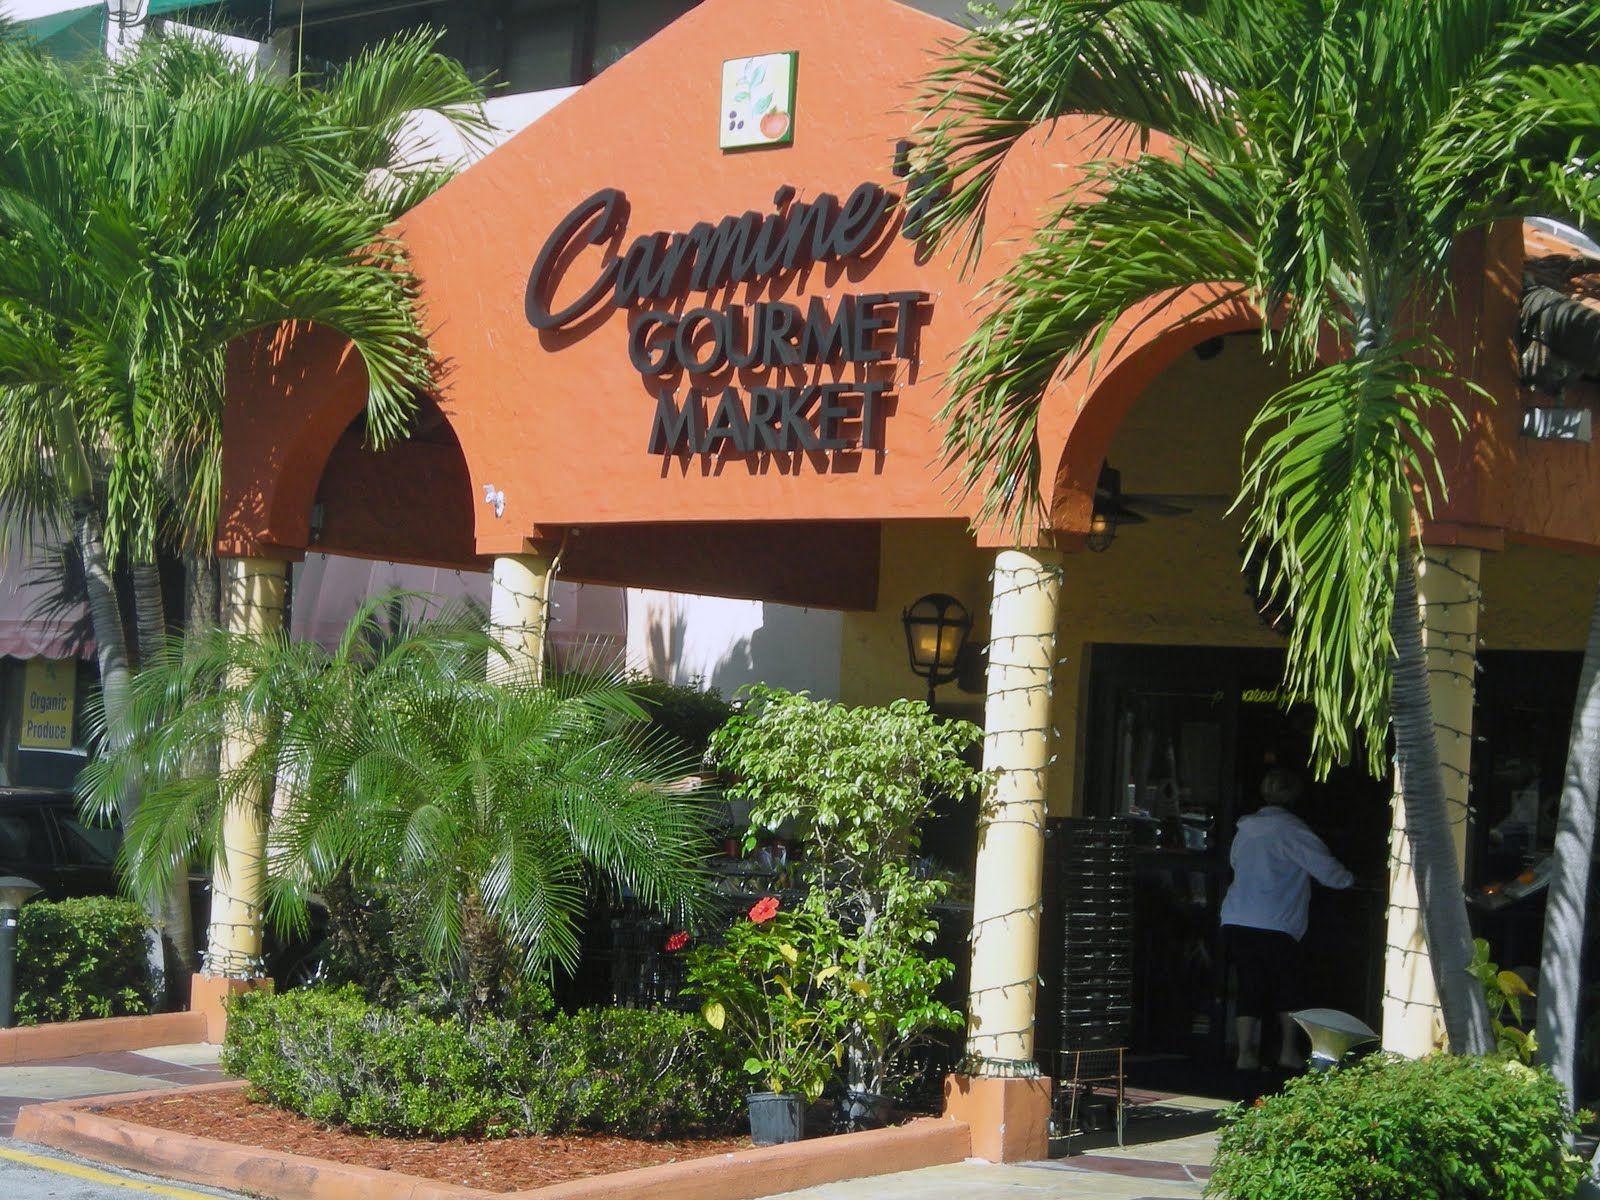 53ee9e0f698fdb7d3914fb82a82eb554 - Carmines Market In Palm Beach Gardens